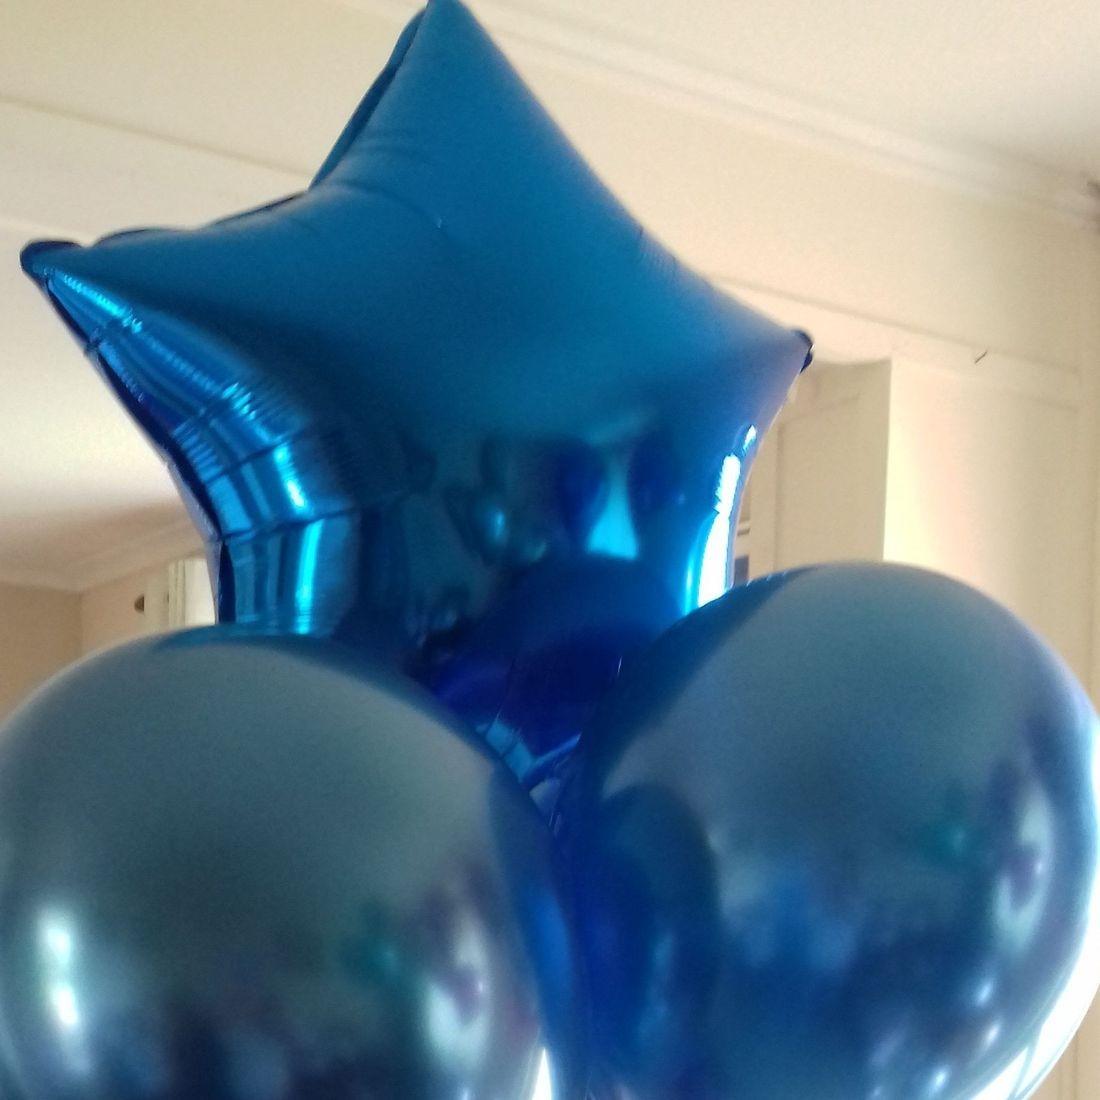 Chrome balloon bouquet